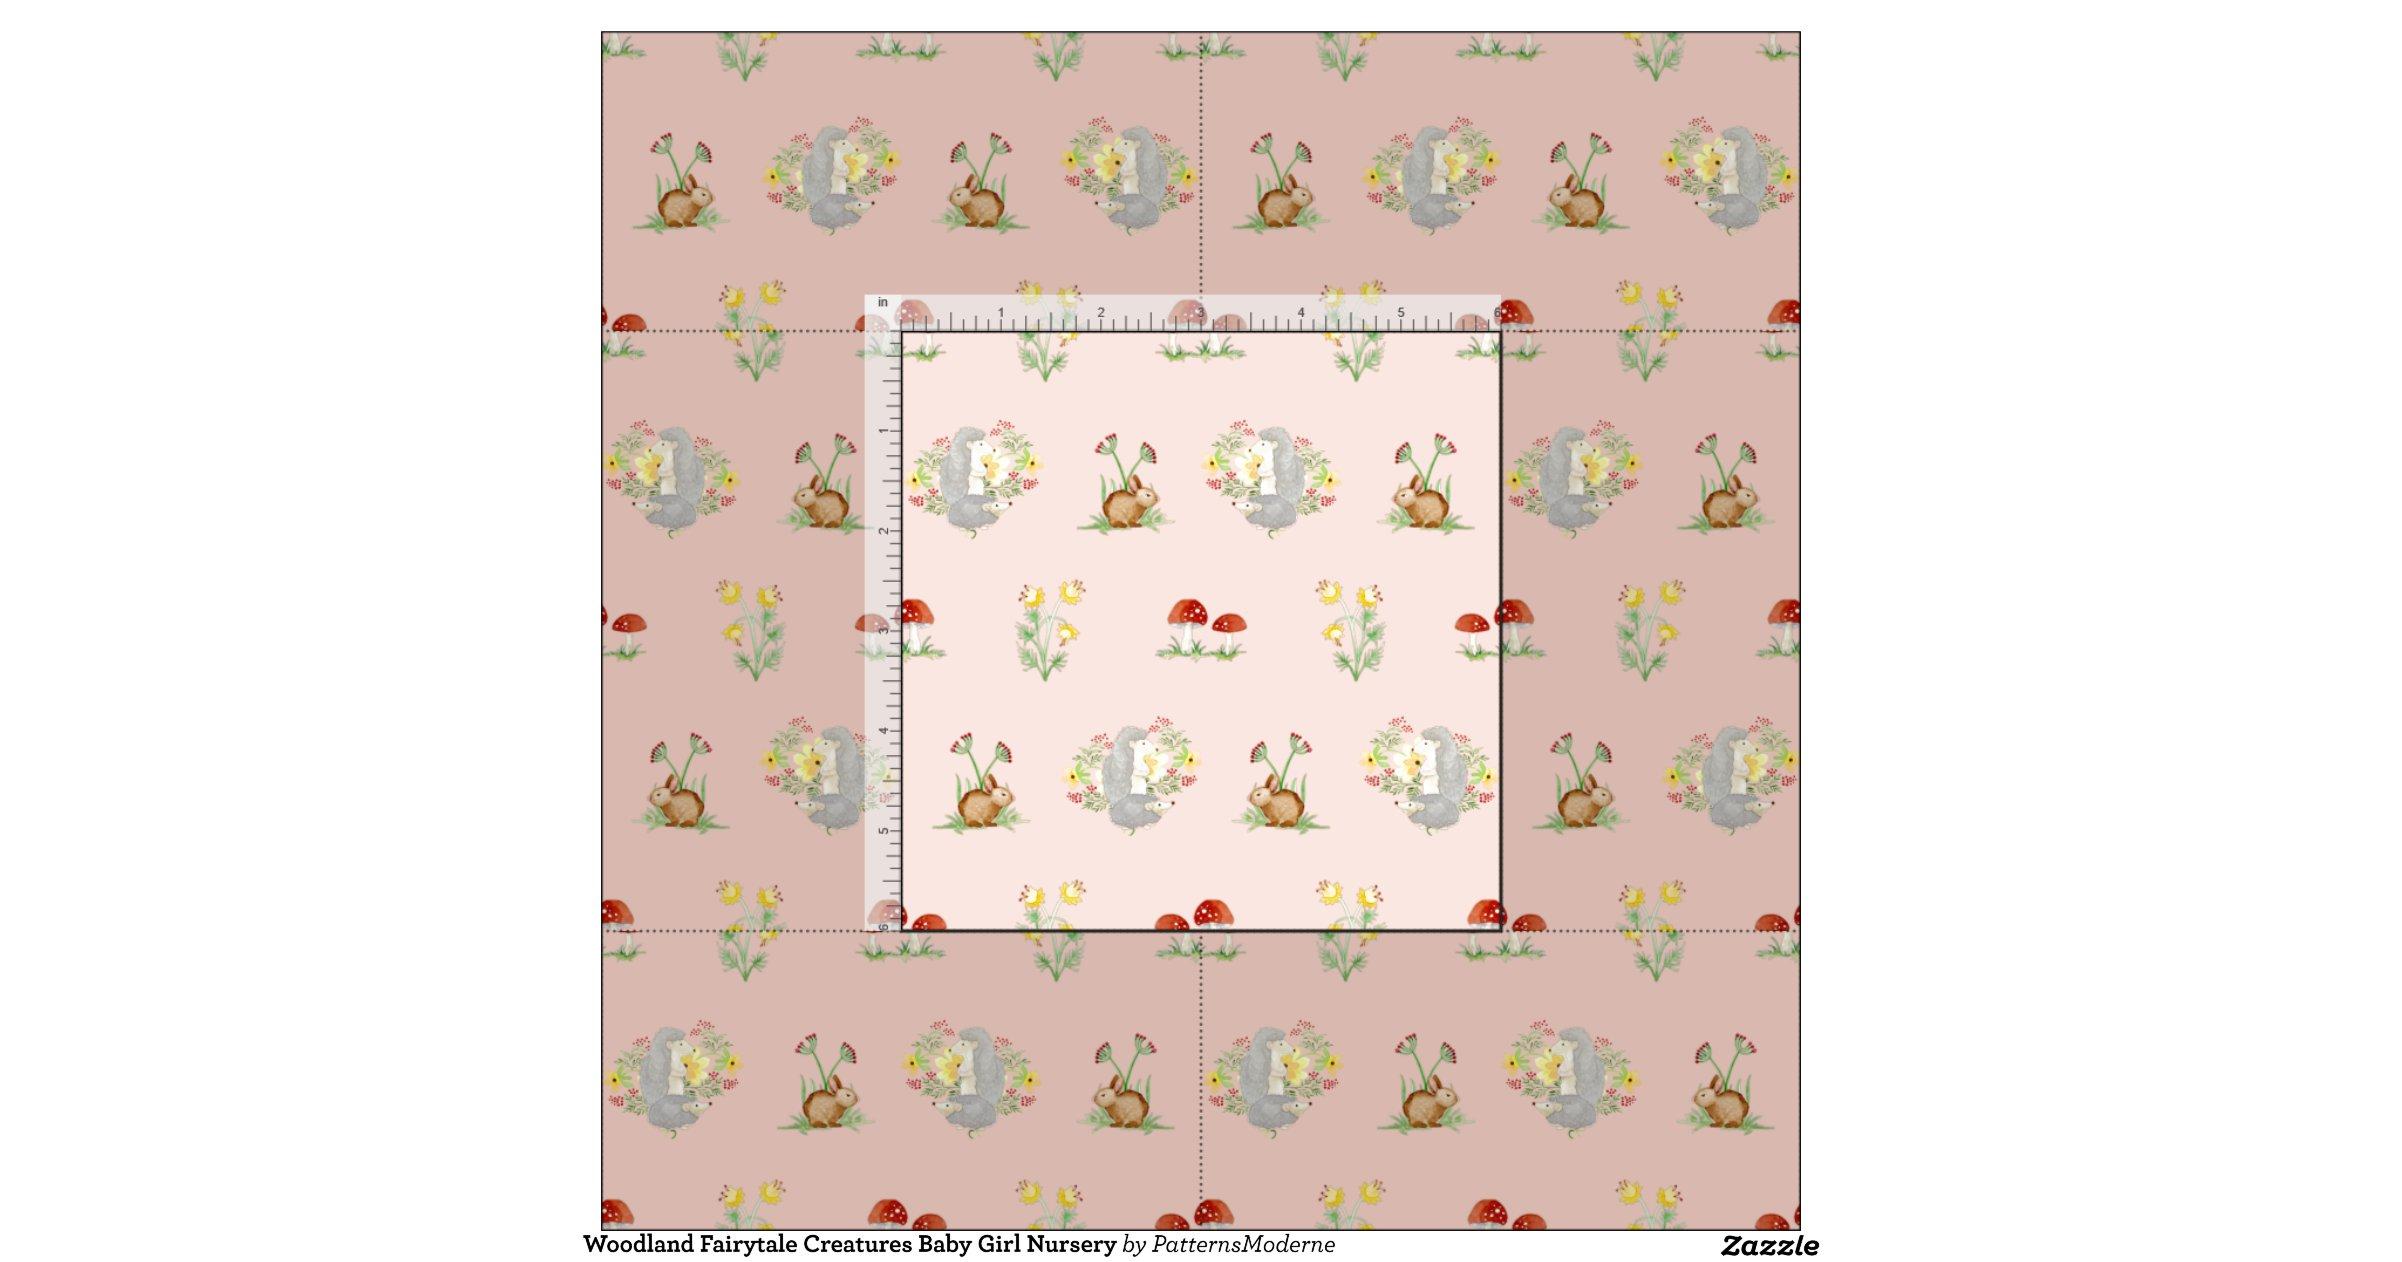 Woodland fairytale creatures baby girl nursery fabric for Baby girl fabric